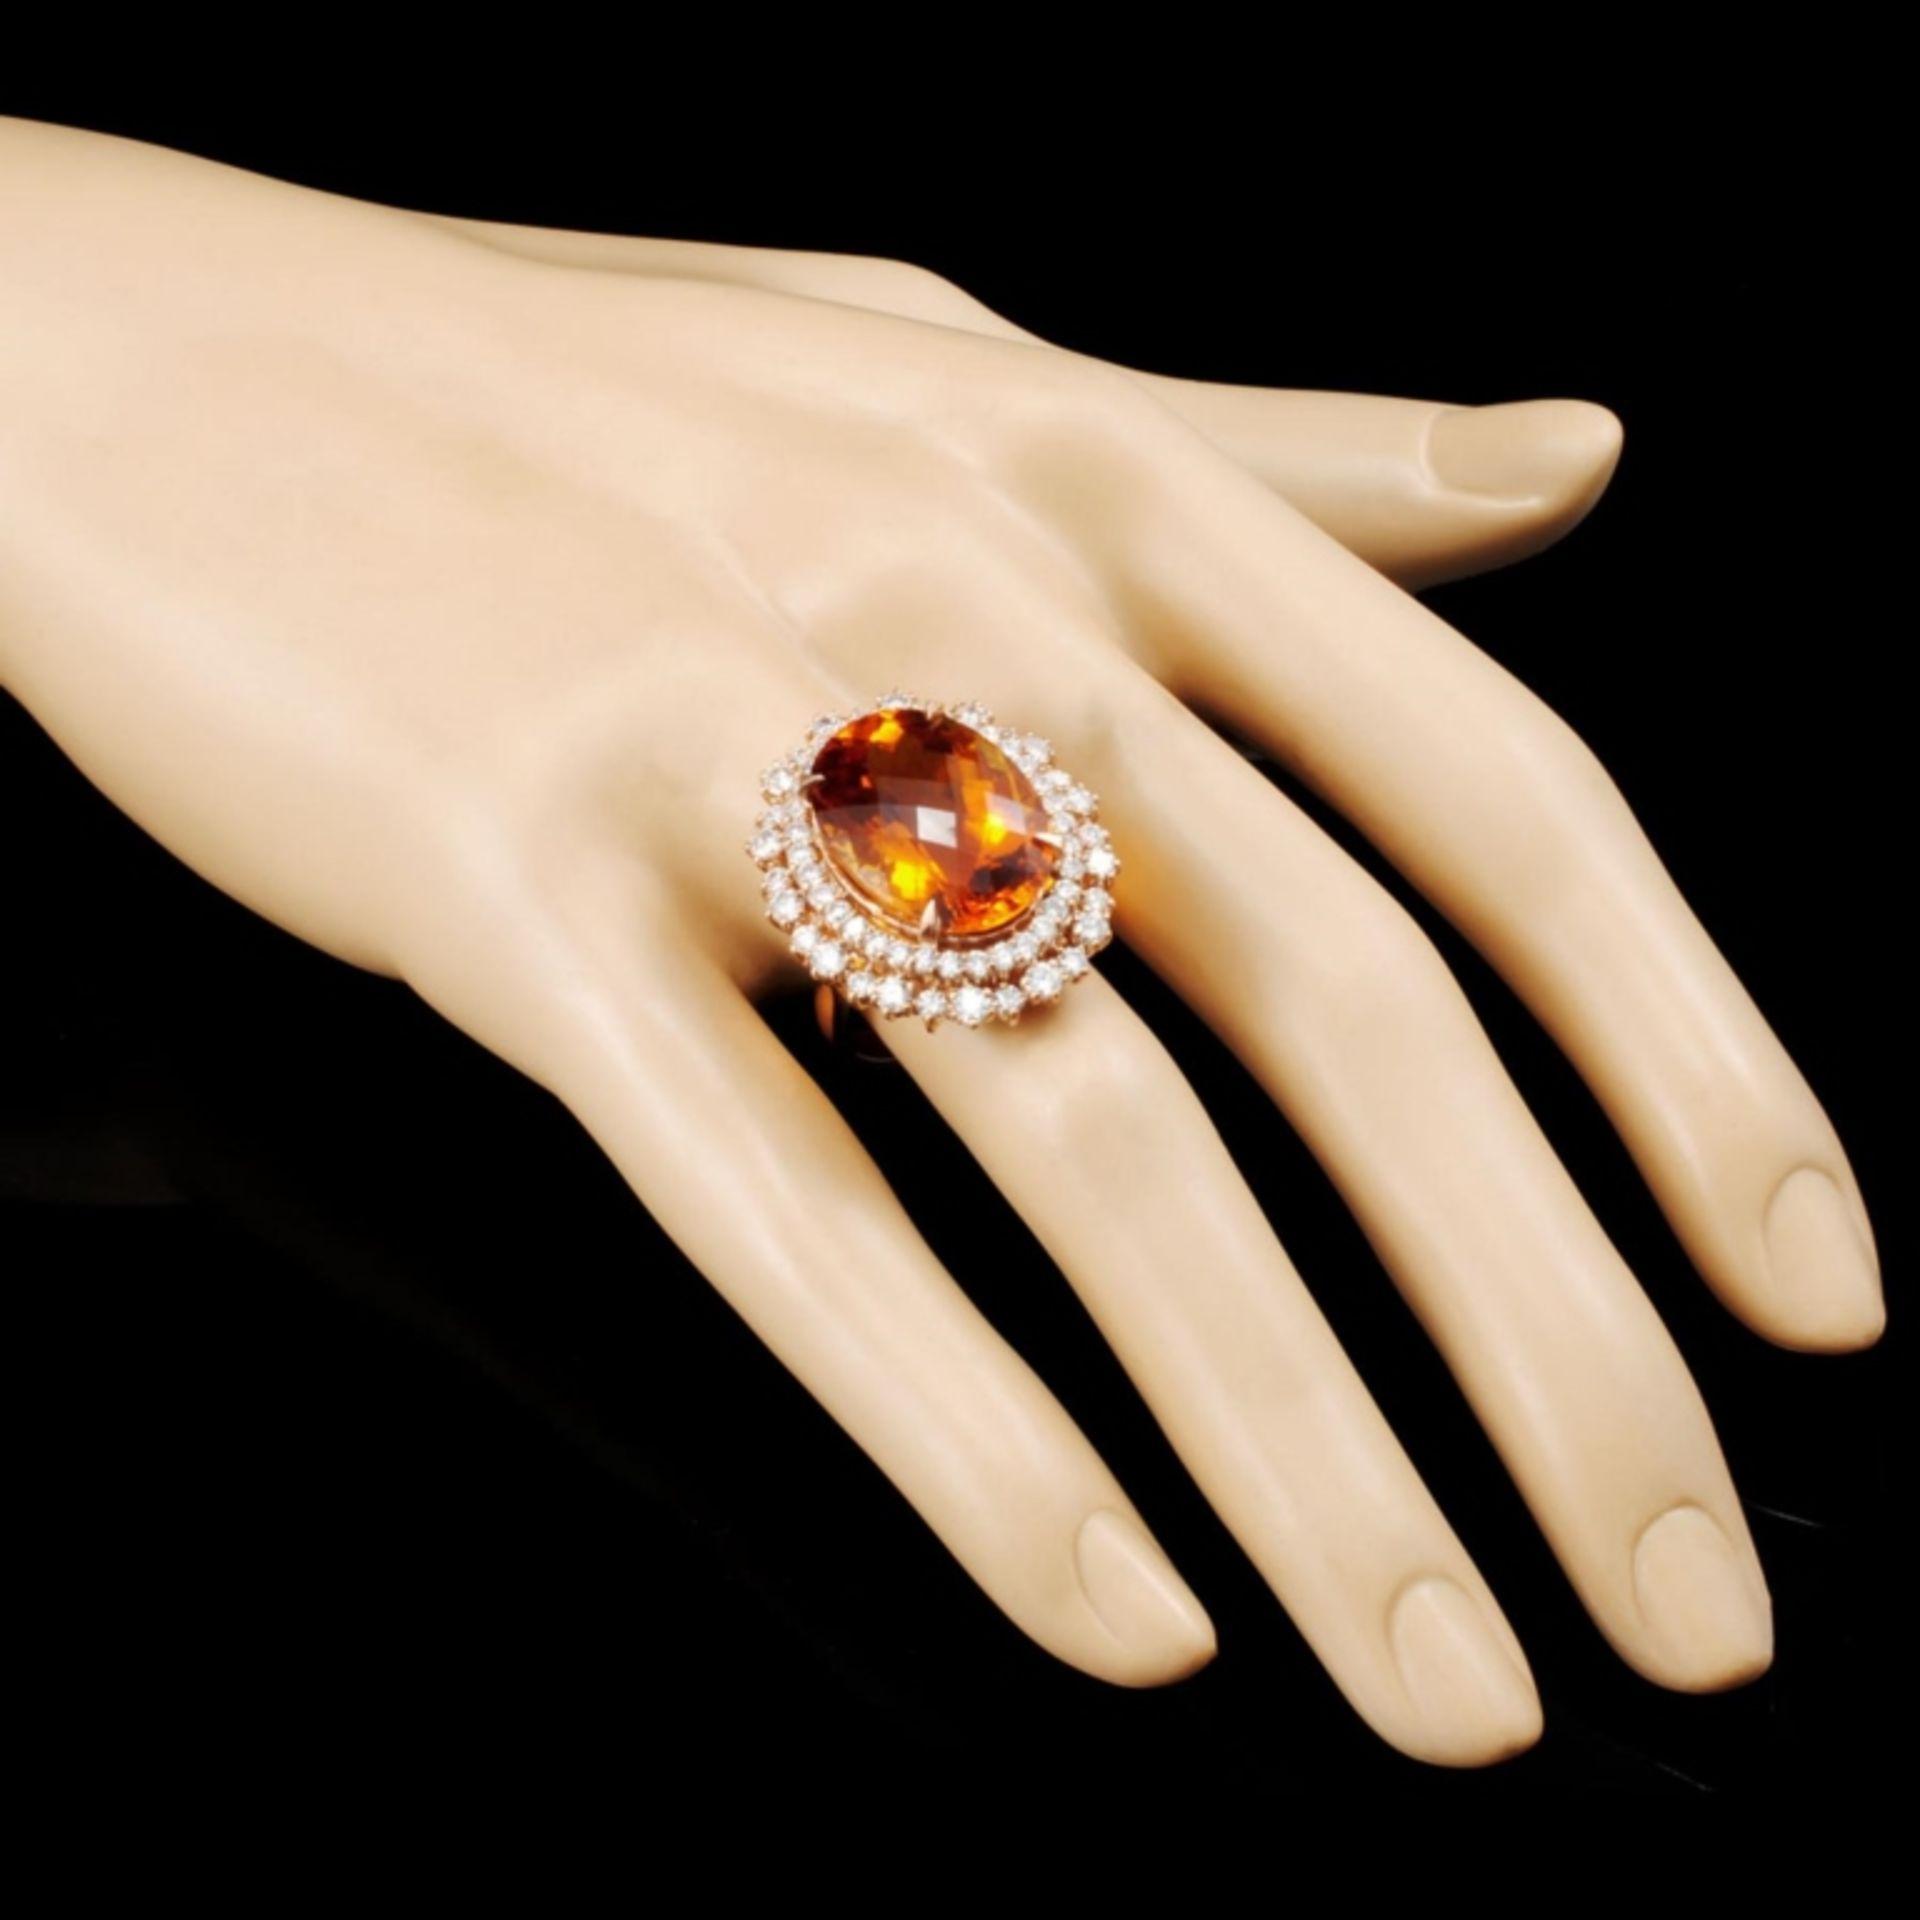 14K Gold 13.82ct Citrine & 2.30ctw Diamond Ring - Image 3 of 5